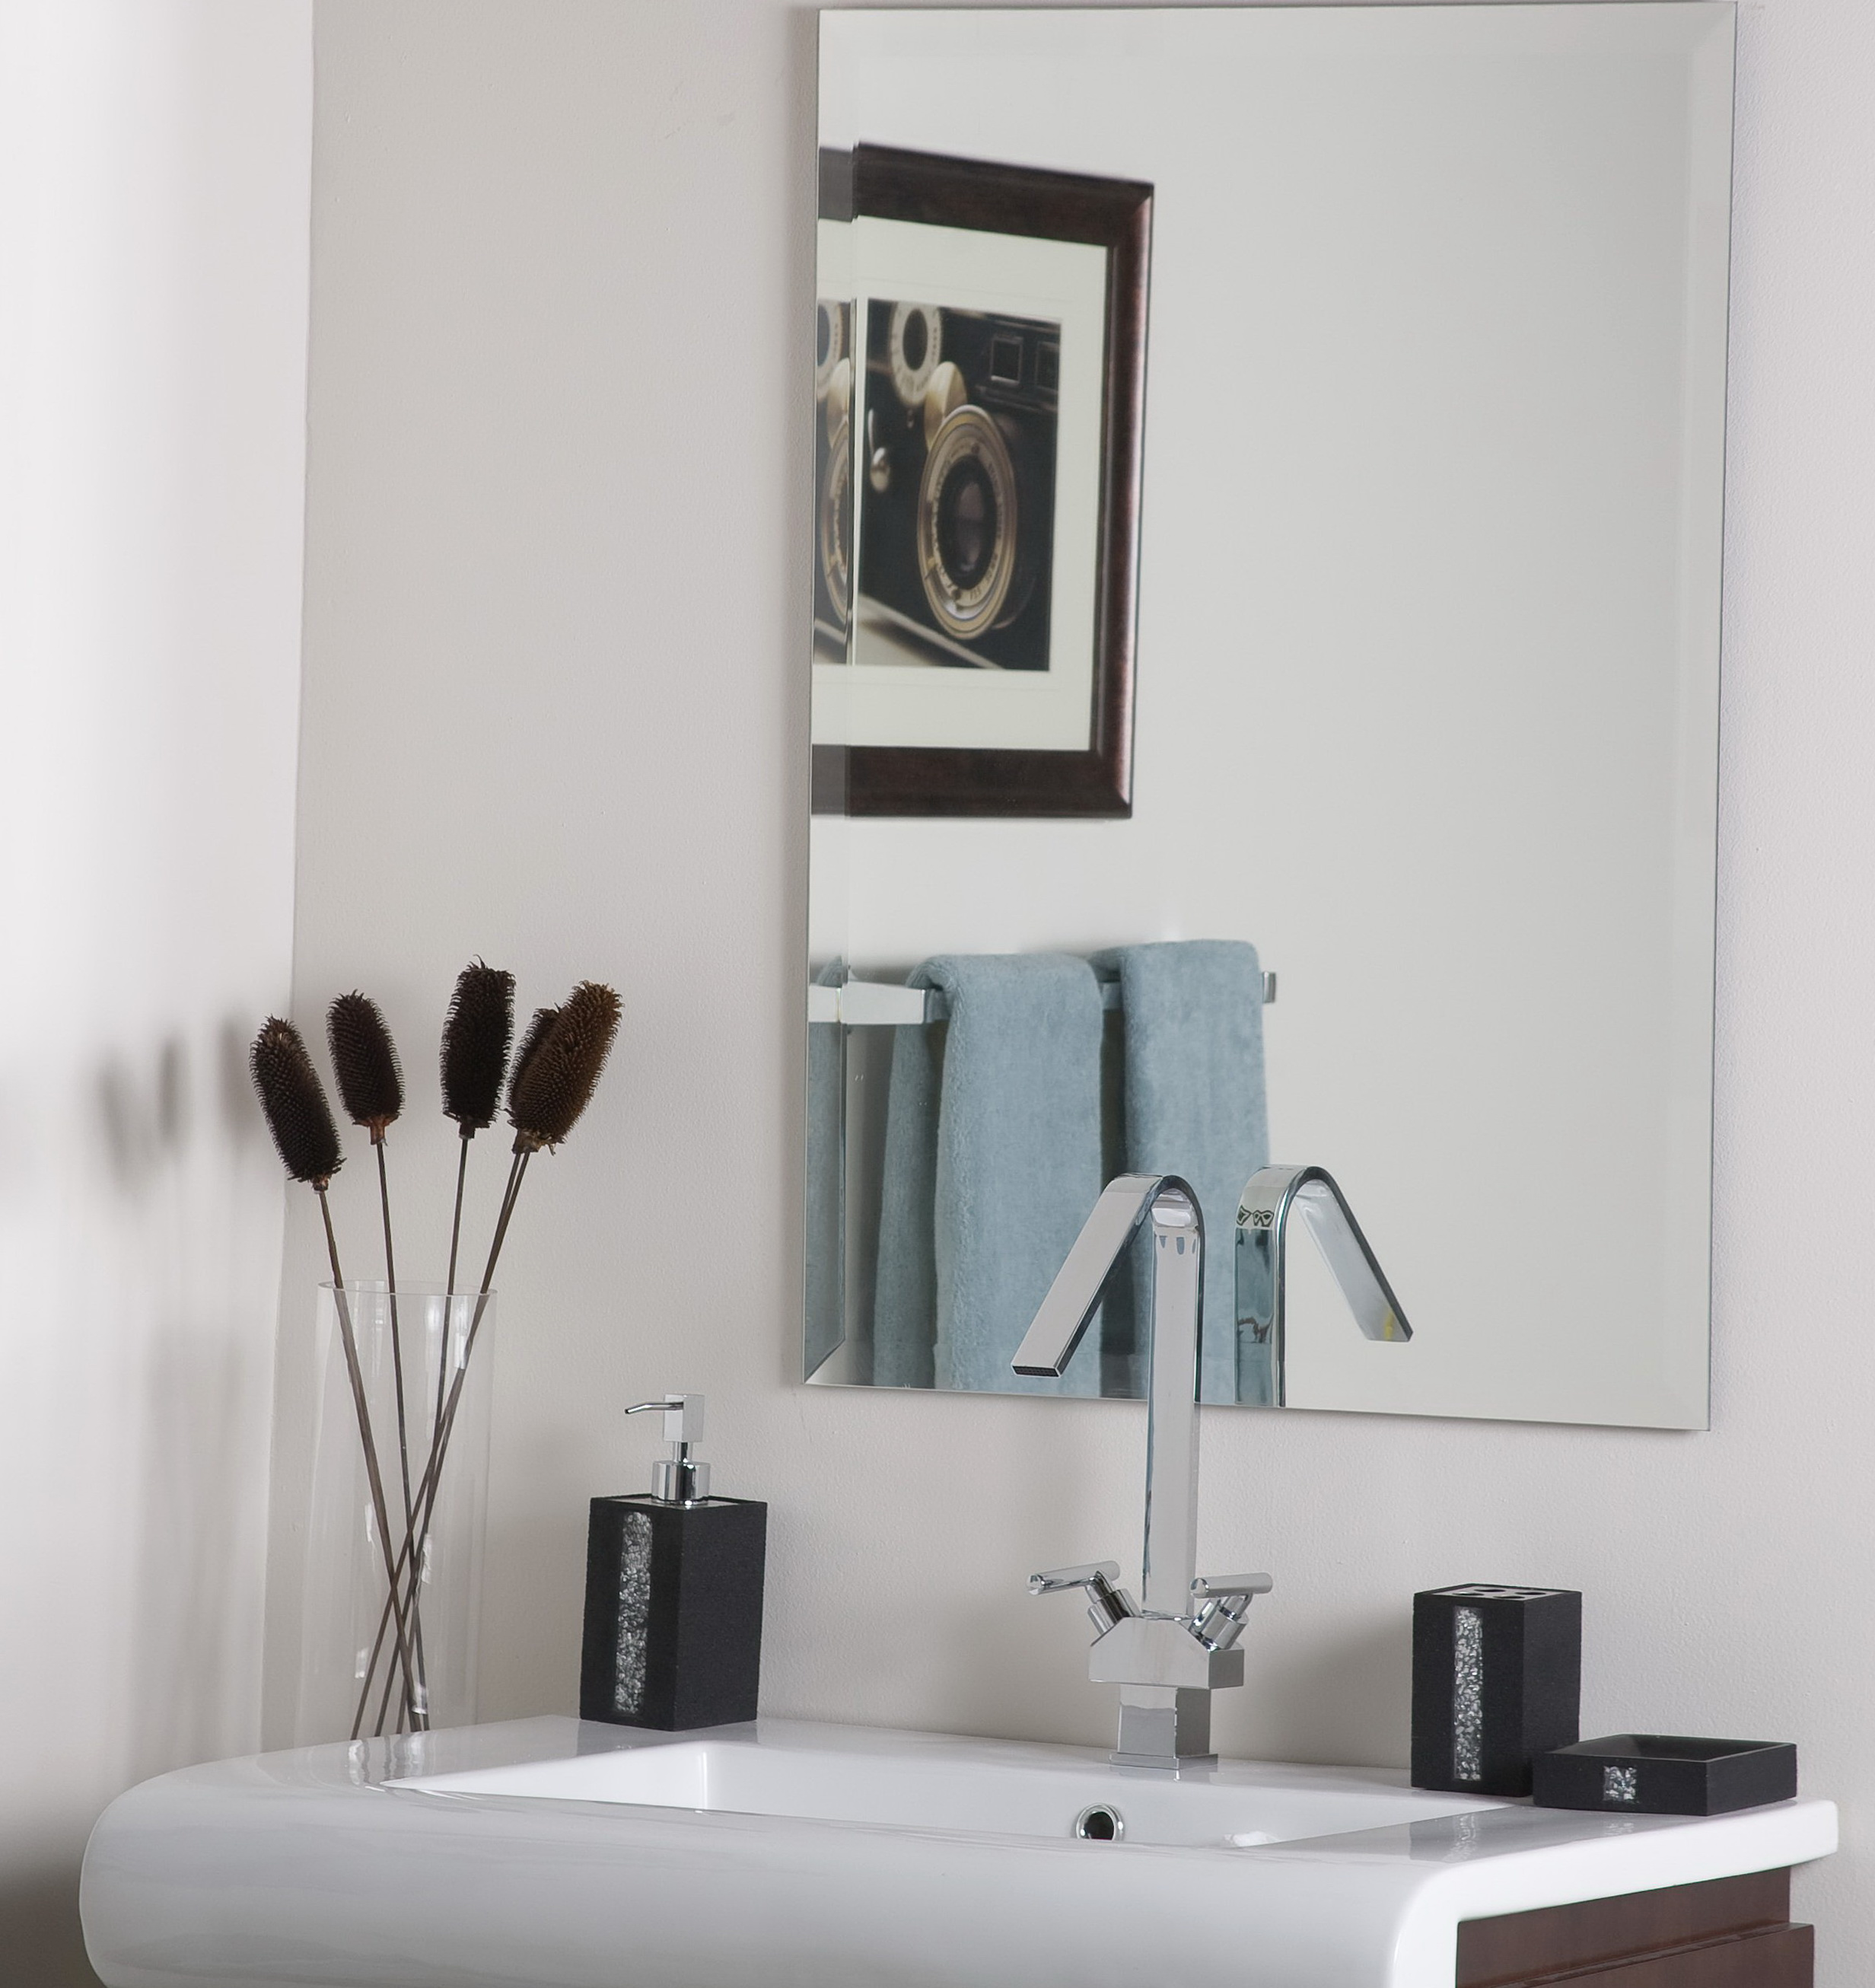 Home Depot Vanity Lights >> Frameless Bathroom Vanity Mirrors | Home Design Ideas